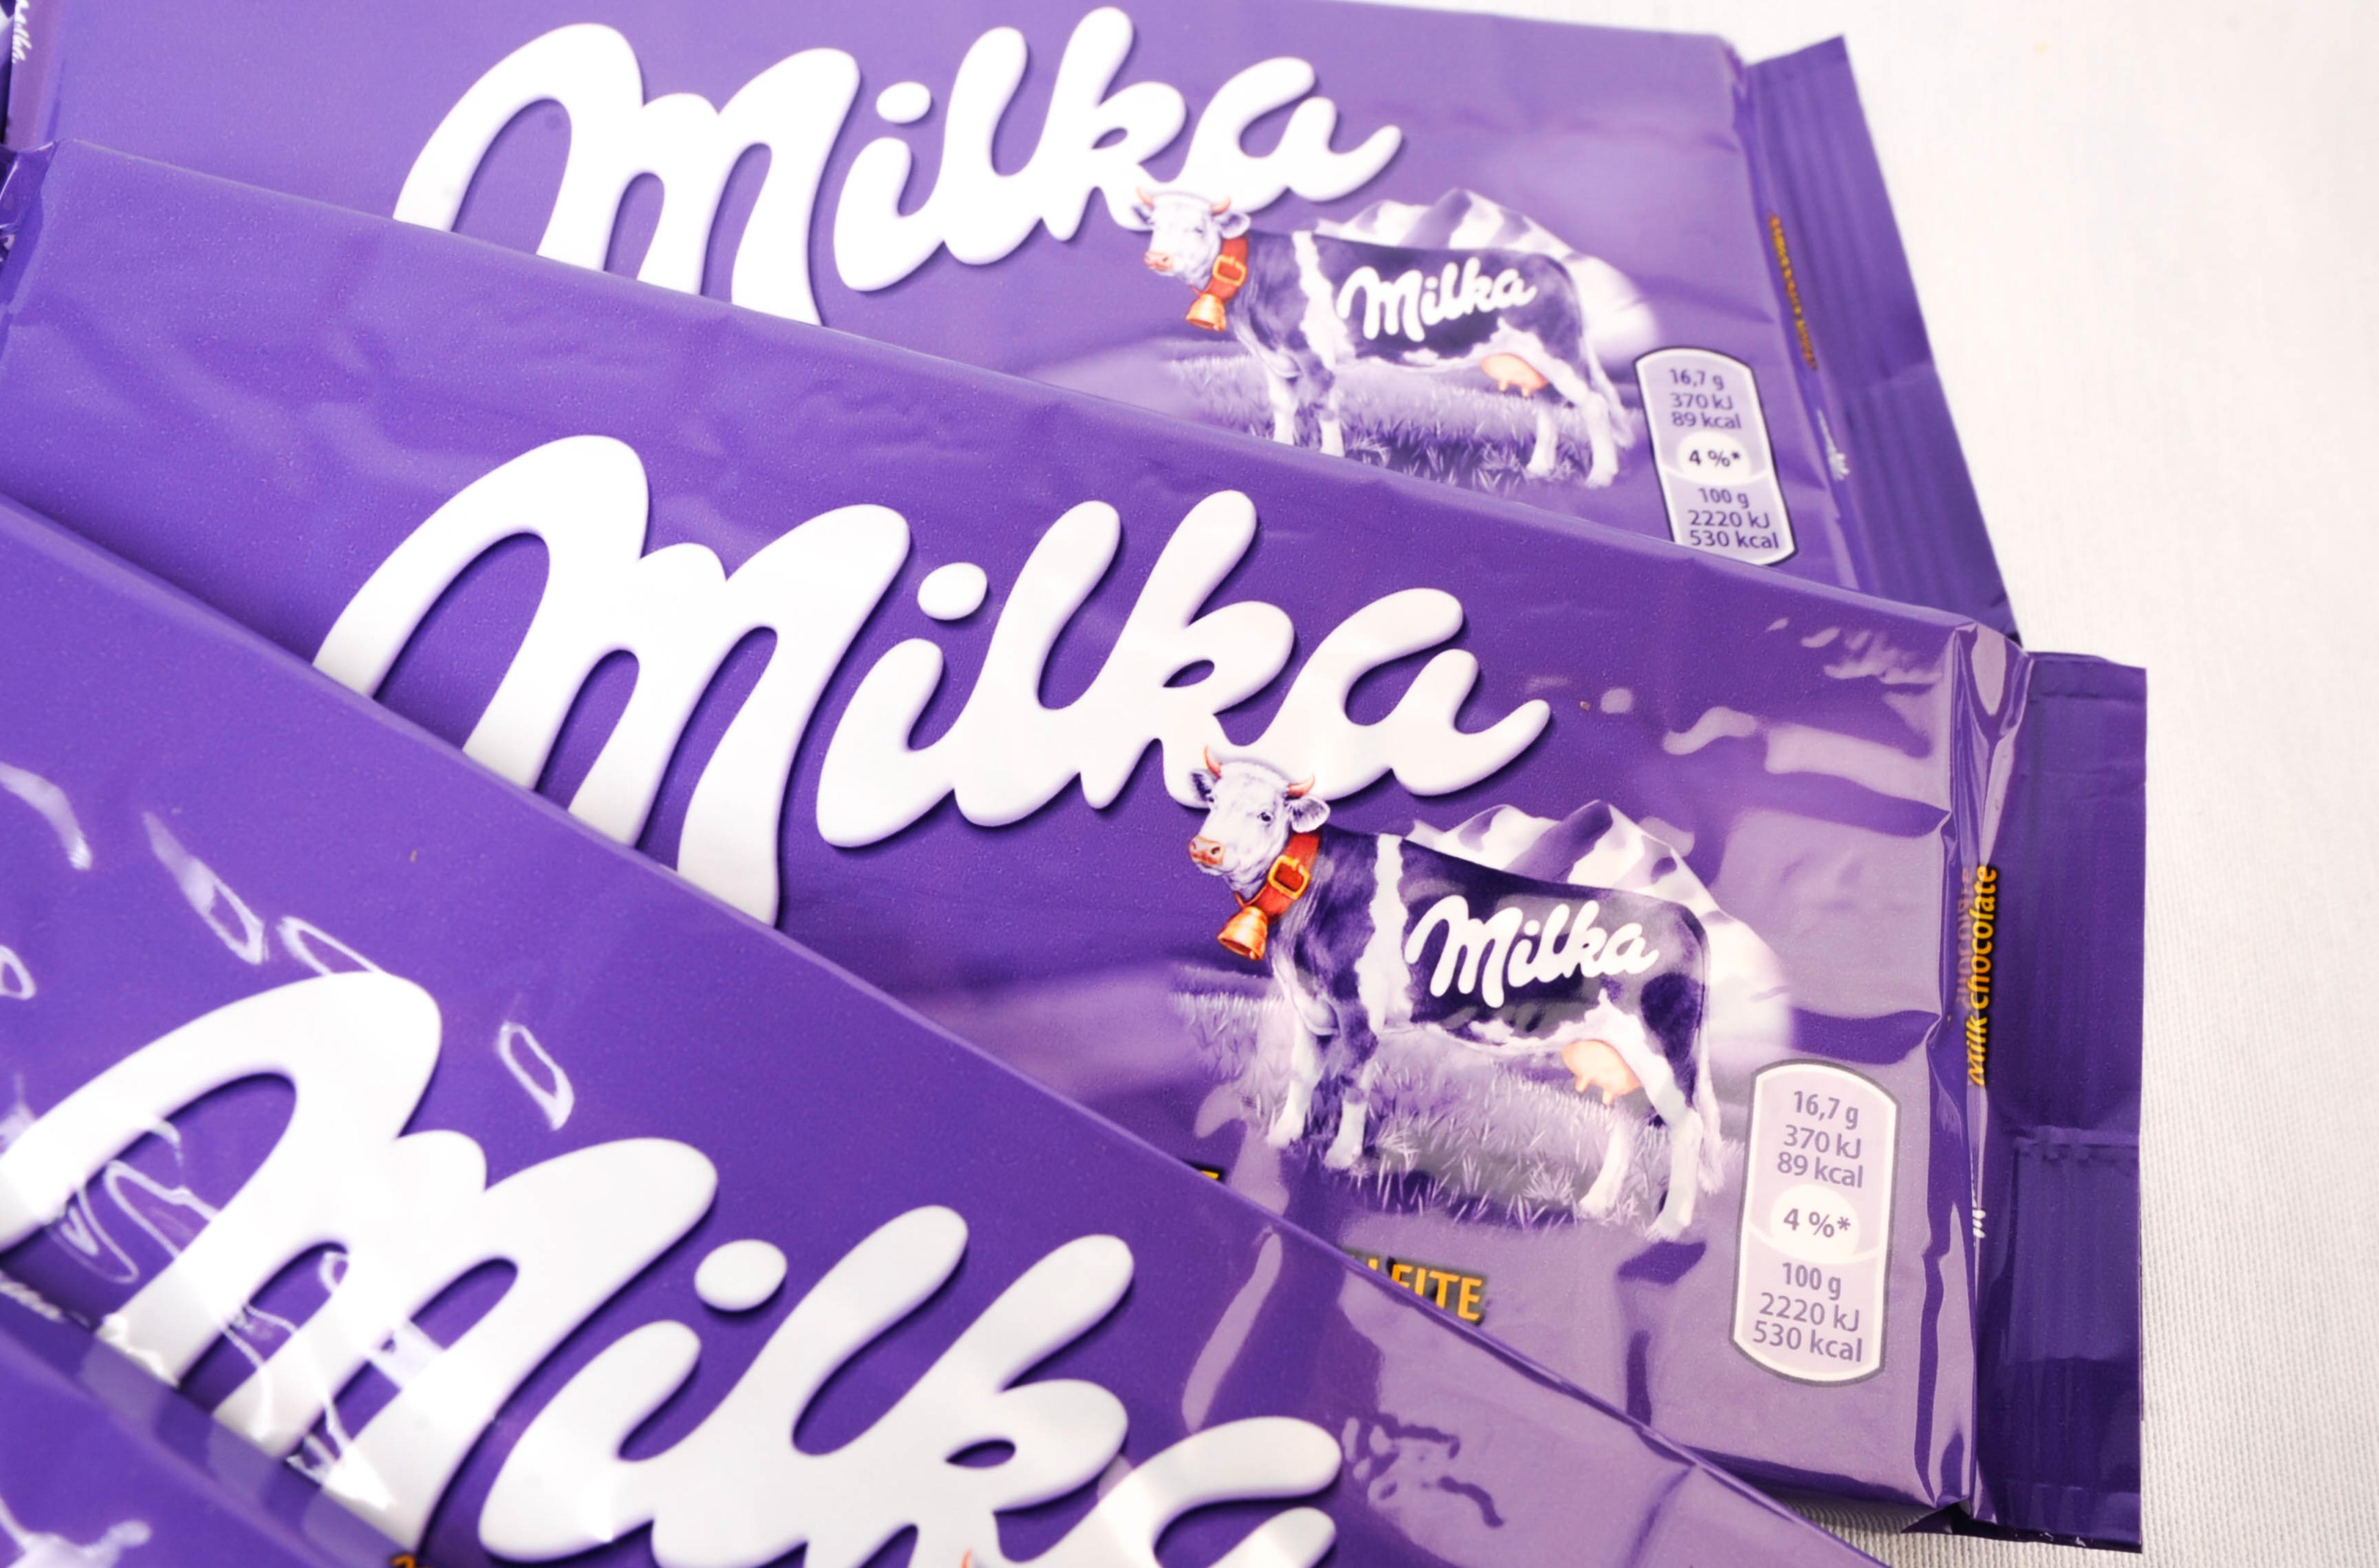 Chocolate confection Milka